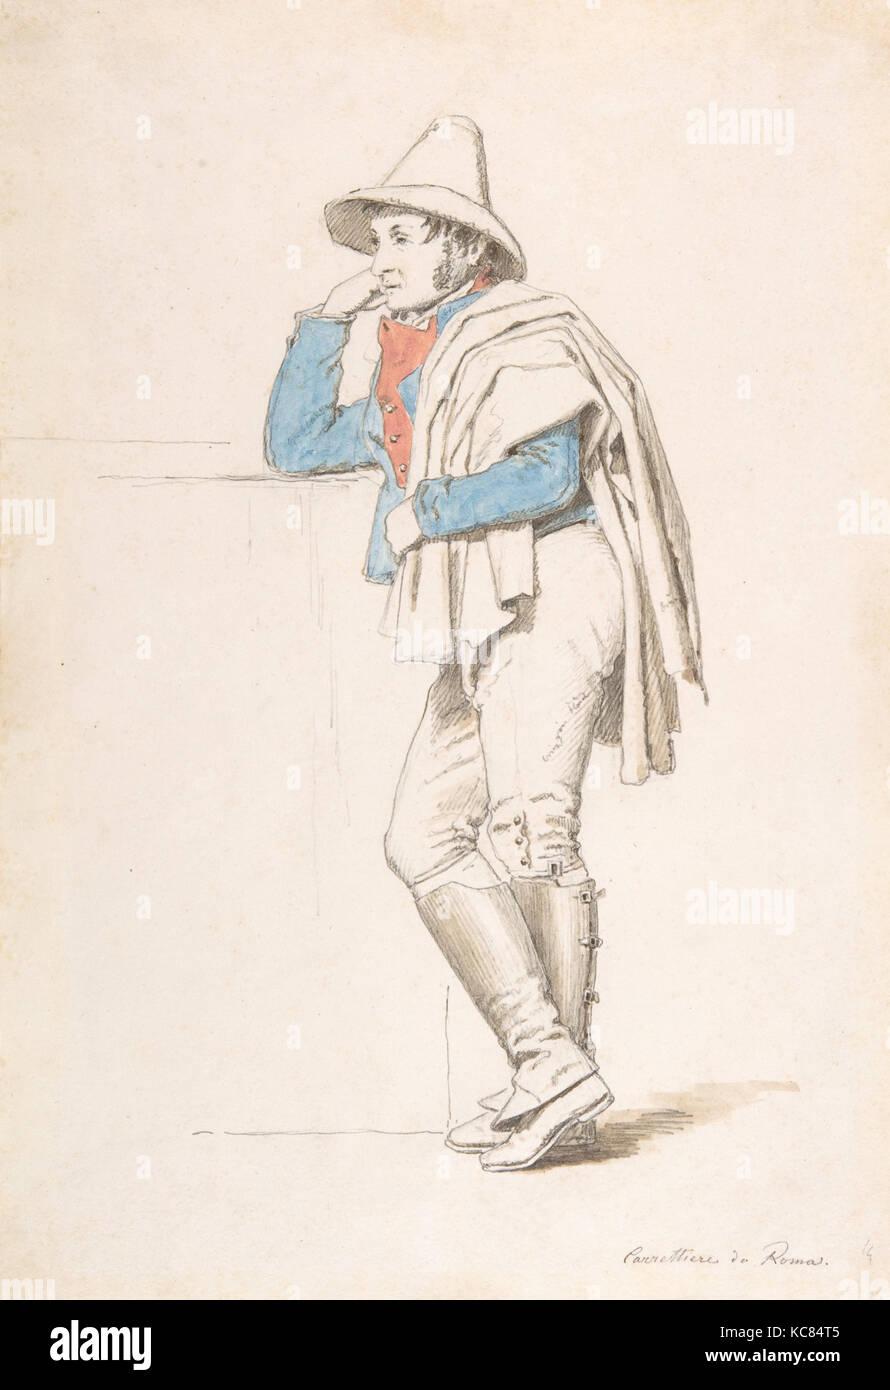 Study of a Roman Coachman, Martinus Rørbye, early 19th century - Stock Image